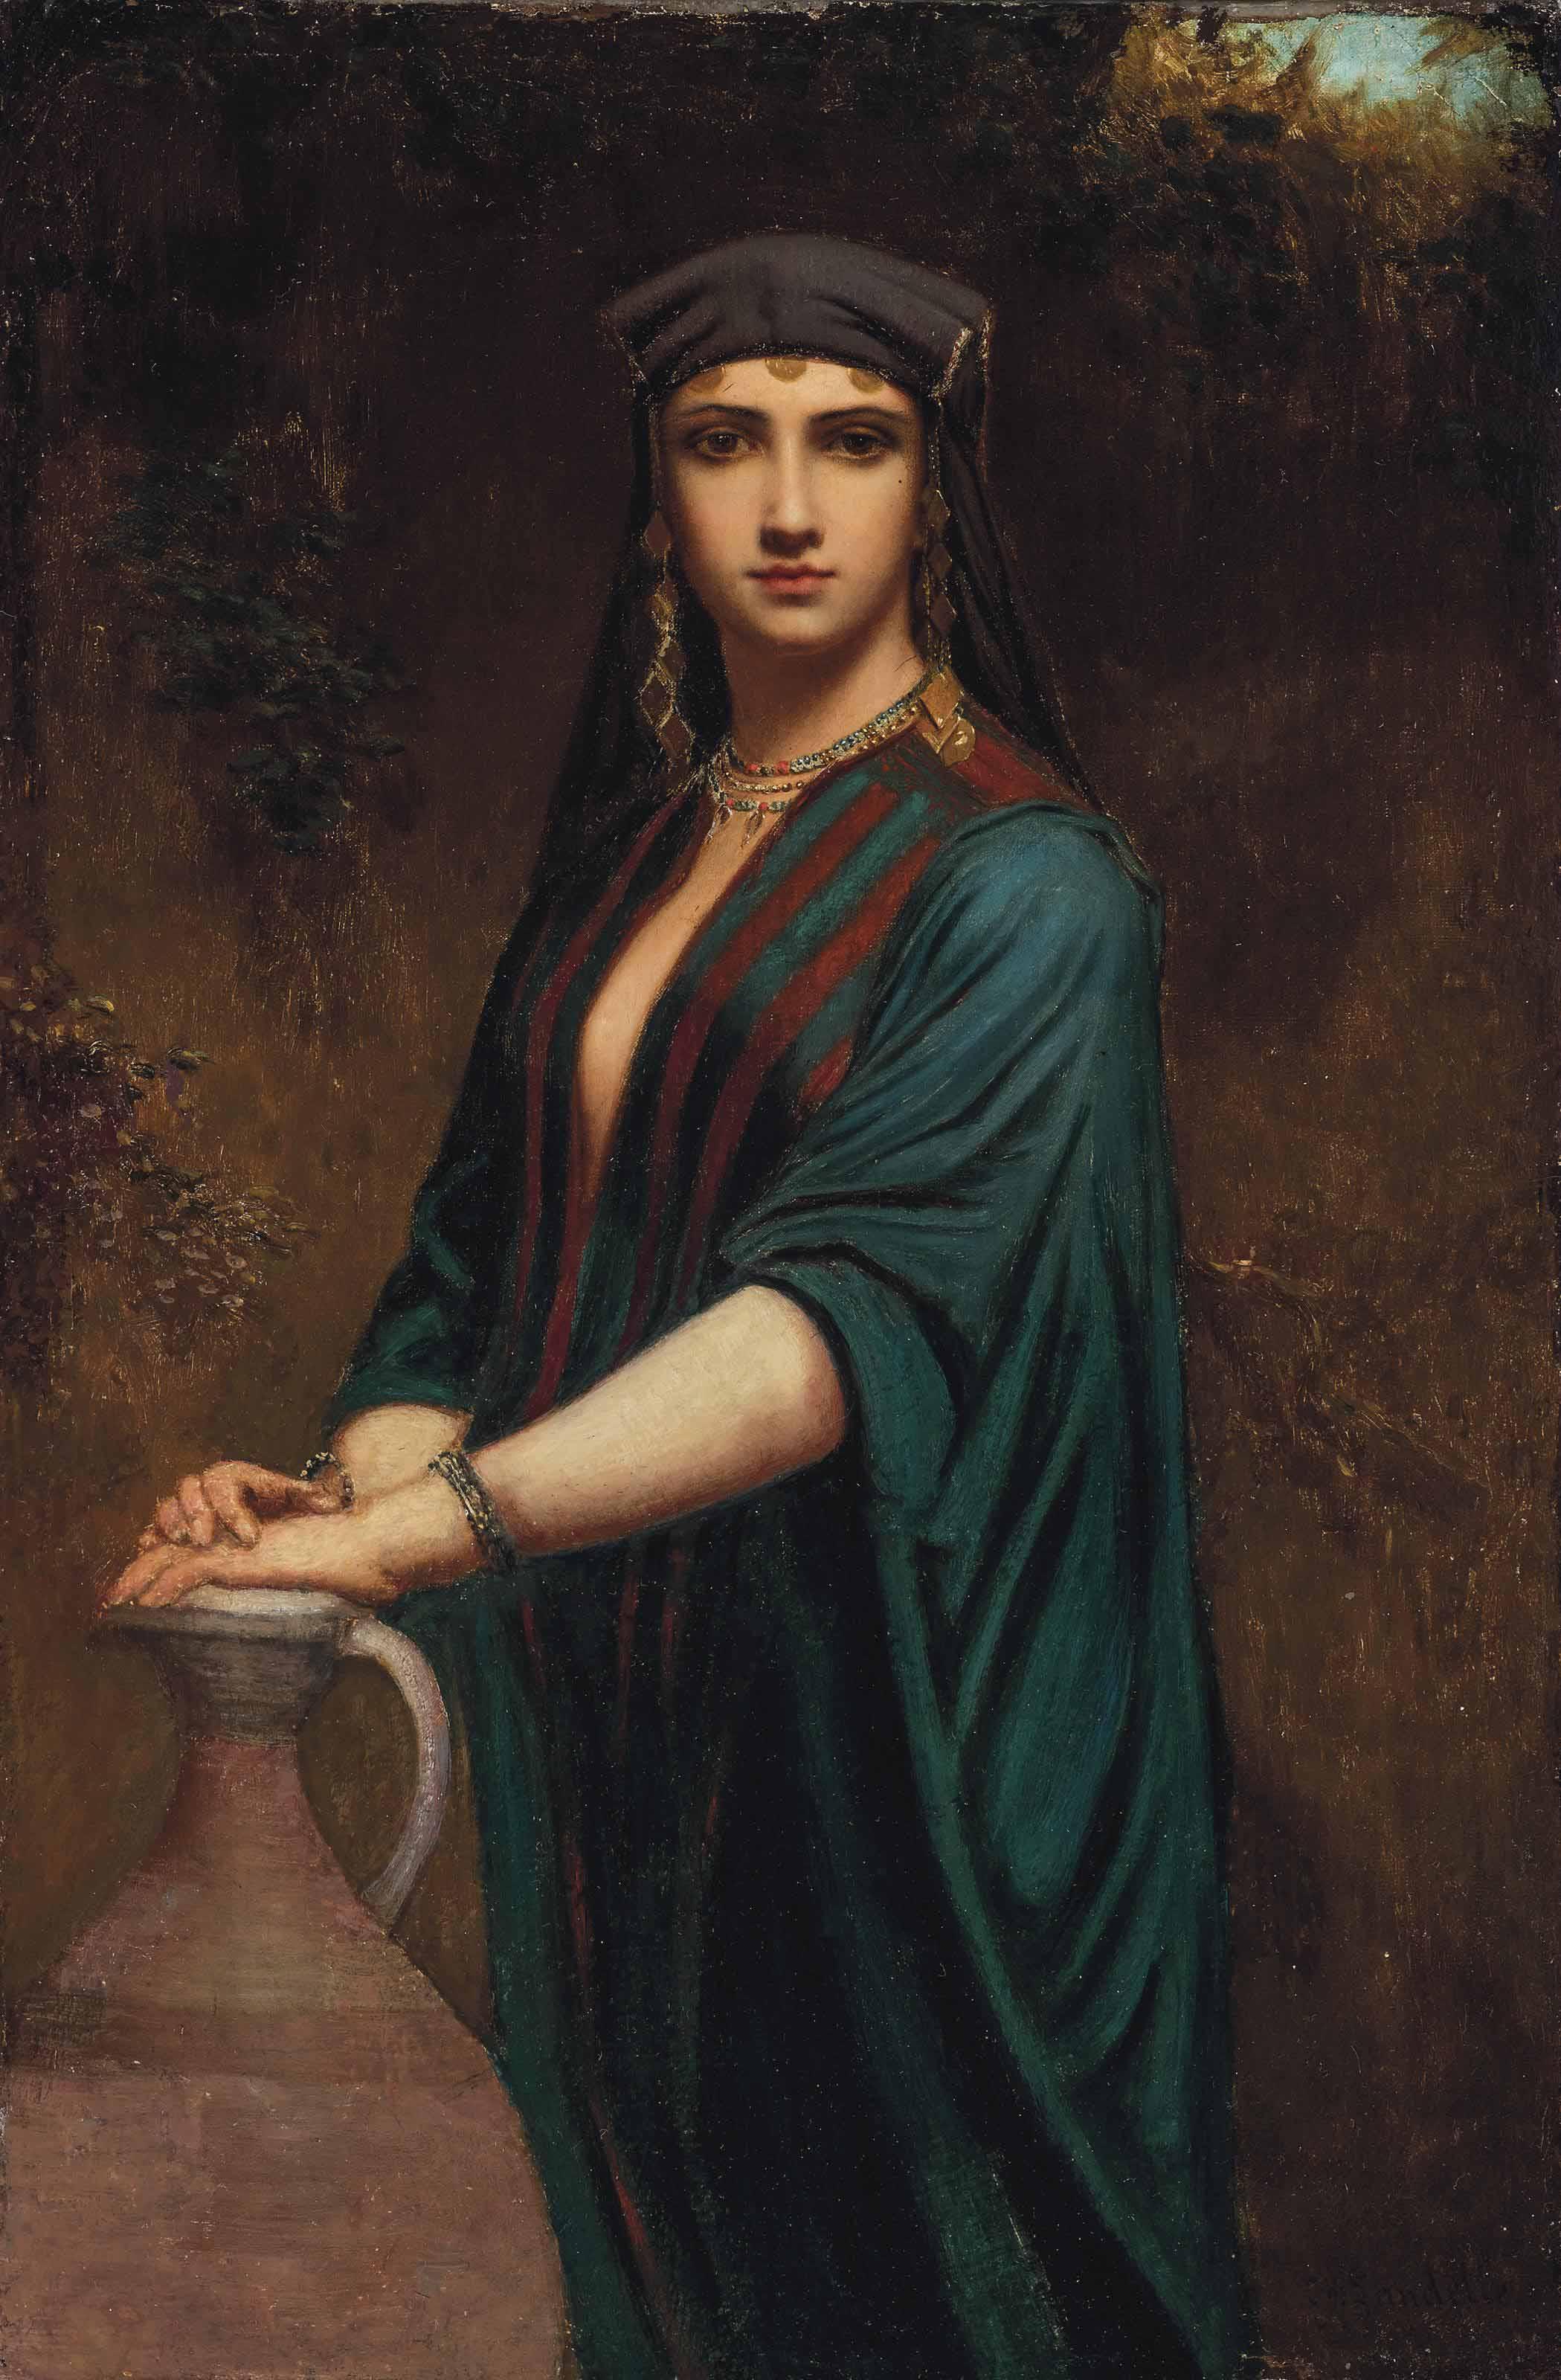 The Egyptian girl